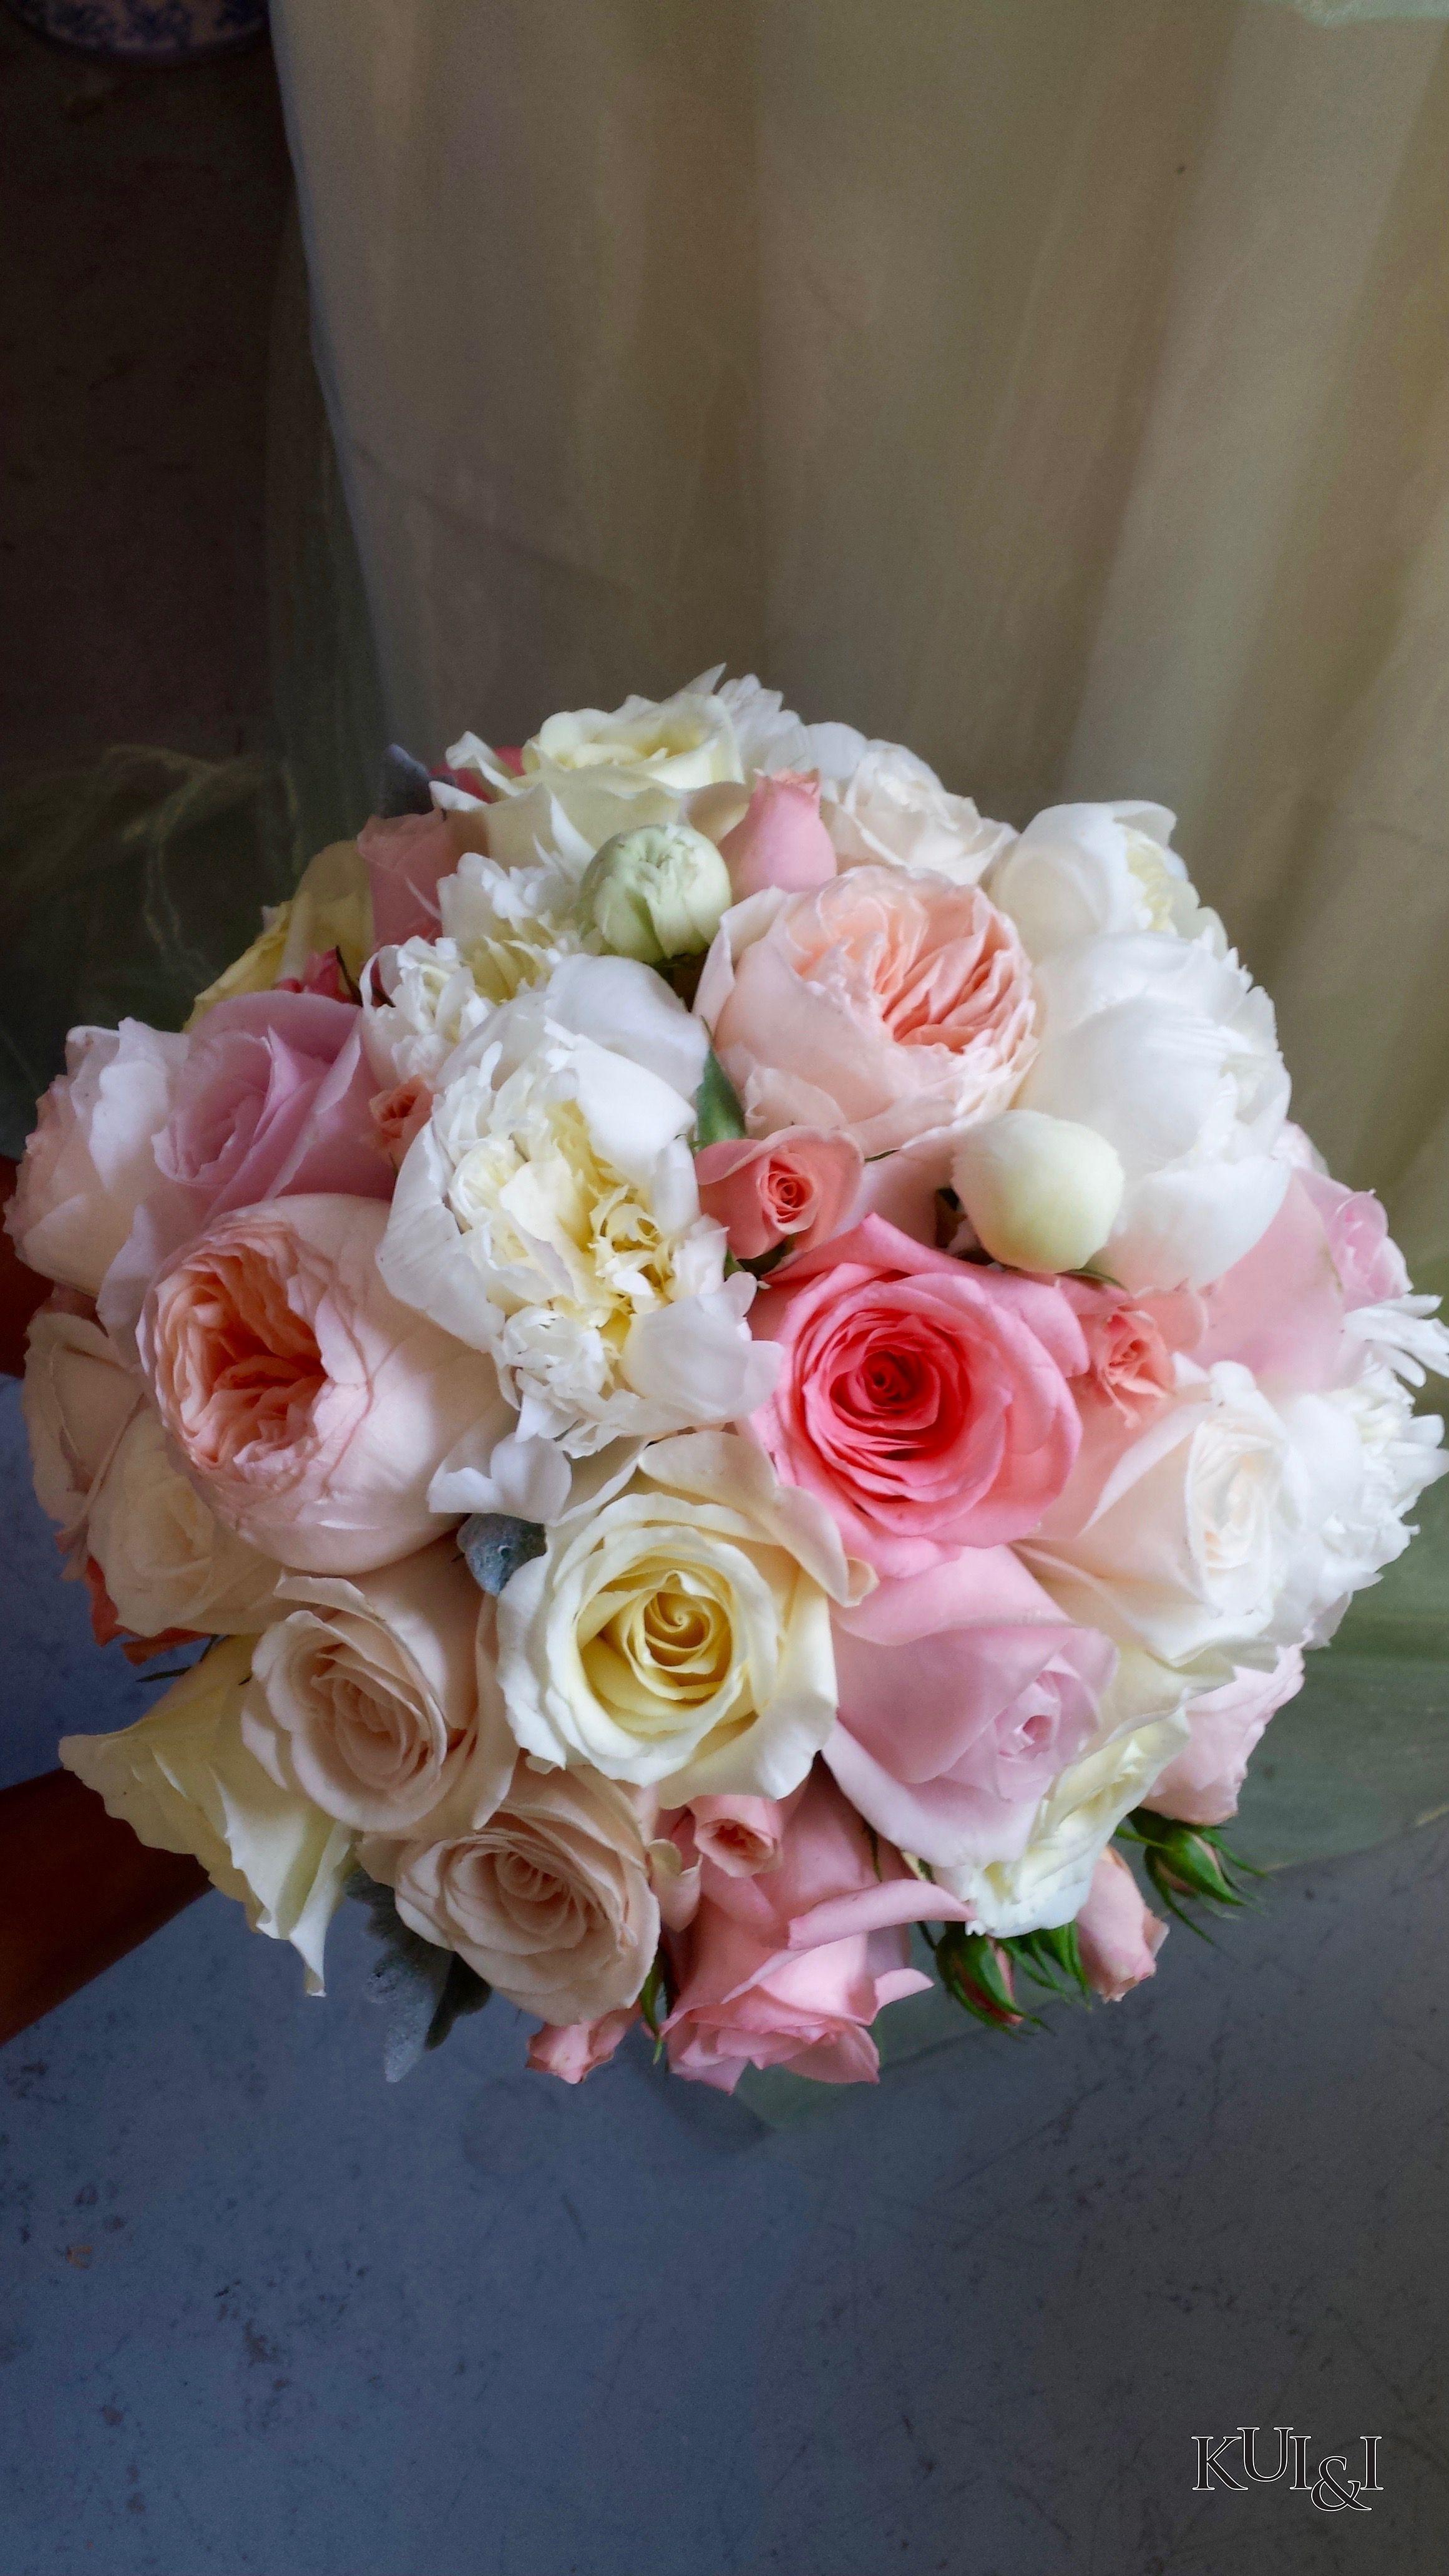 Soft Pastel Wedding Bouquet Kui I Florist Llc Hilo Hawaii